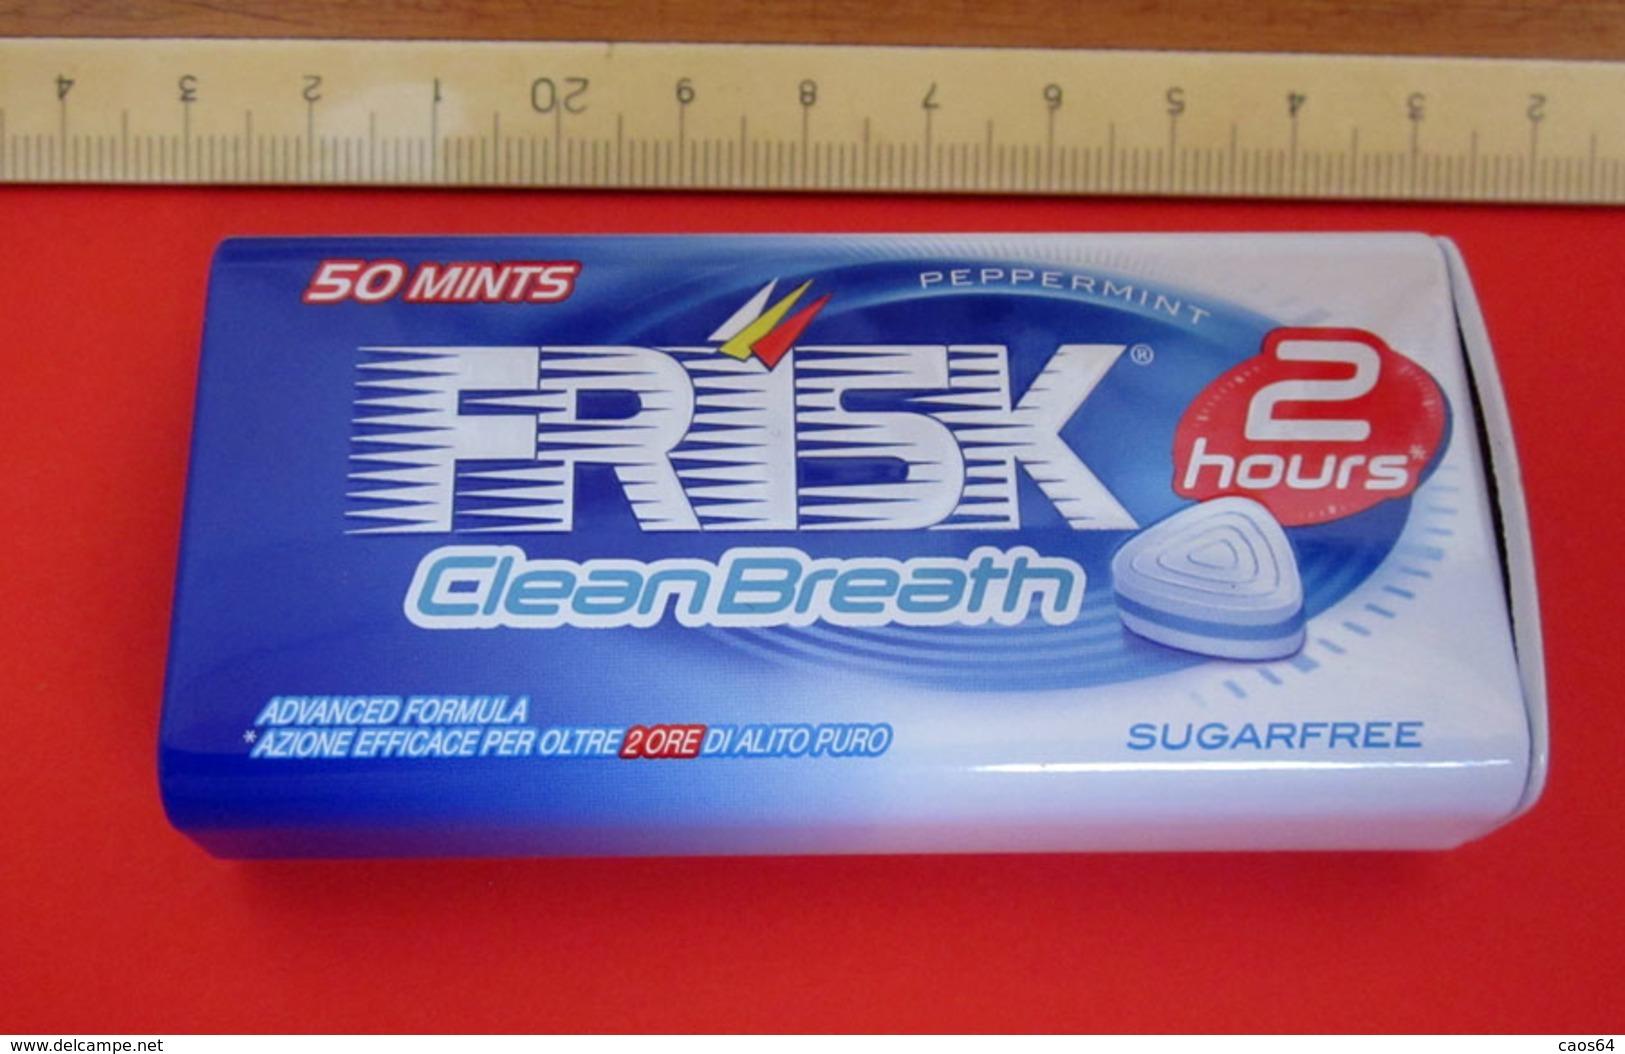 FRISK CLEAN BREATH 50 MINTS - Scatole